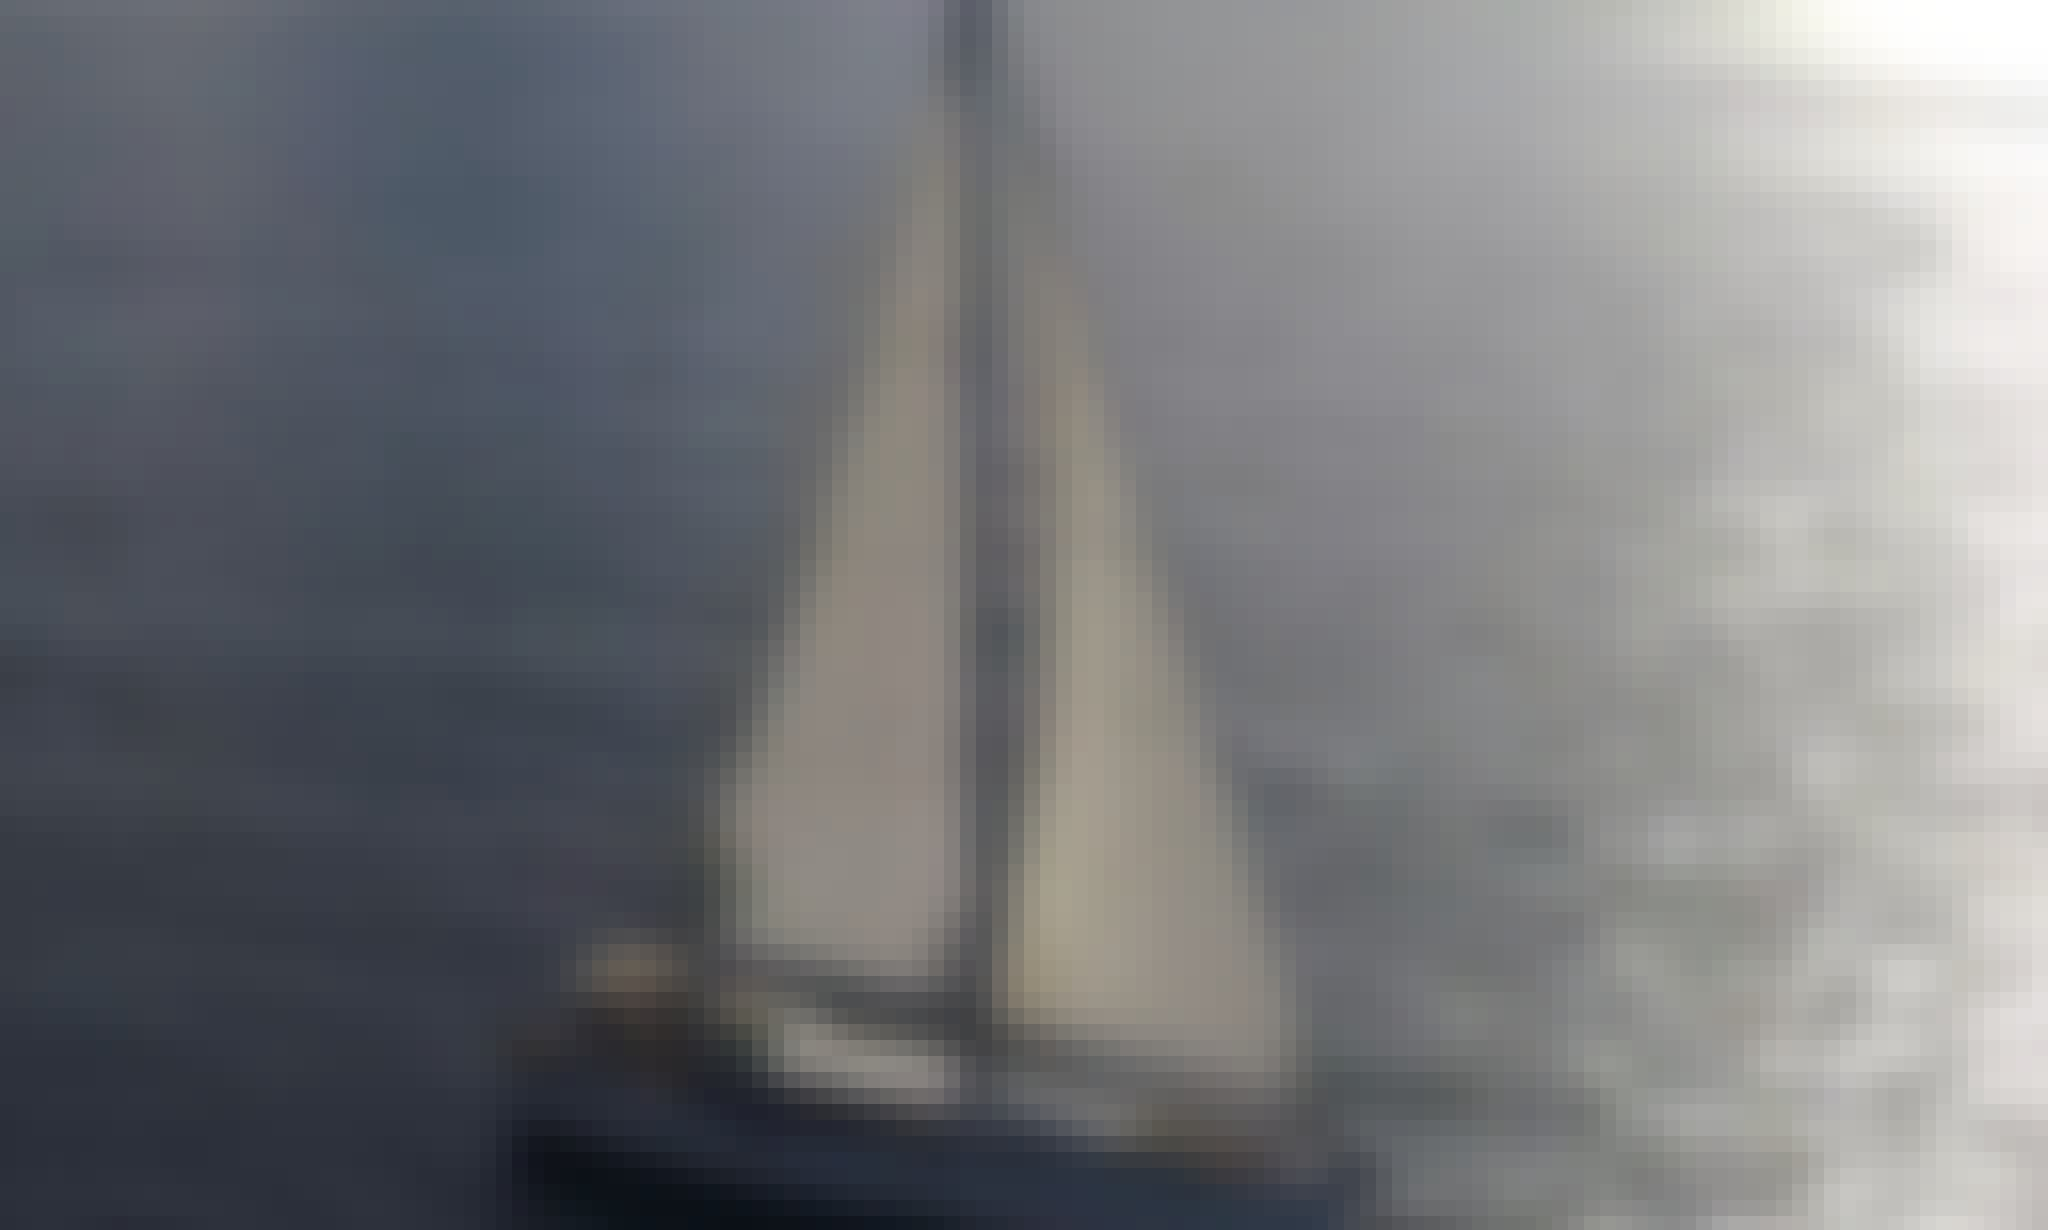 luxurious Sense 50 by Beneteau kewalo harbor, honolulu, hi 96814